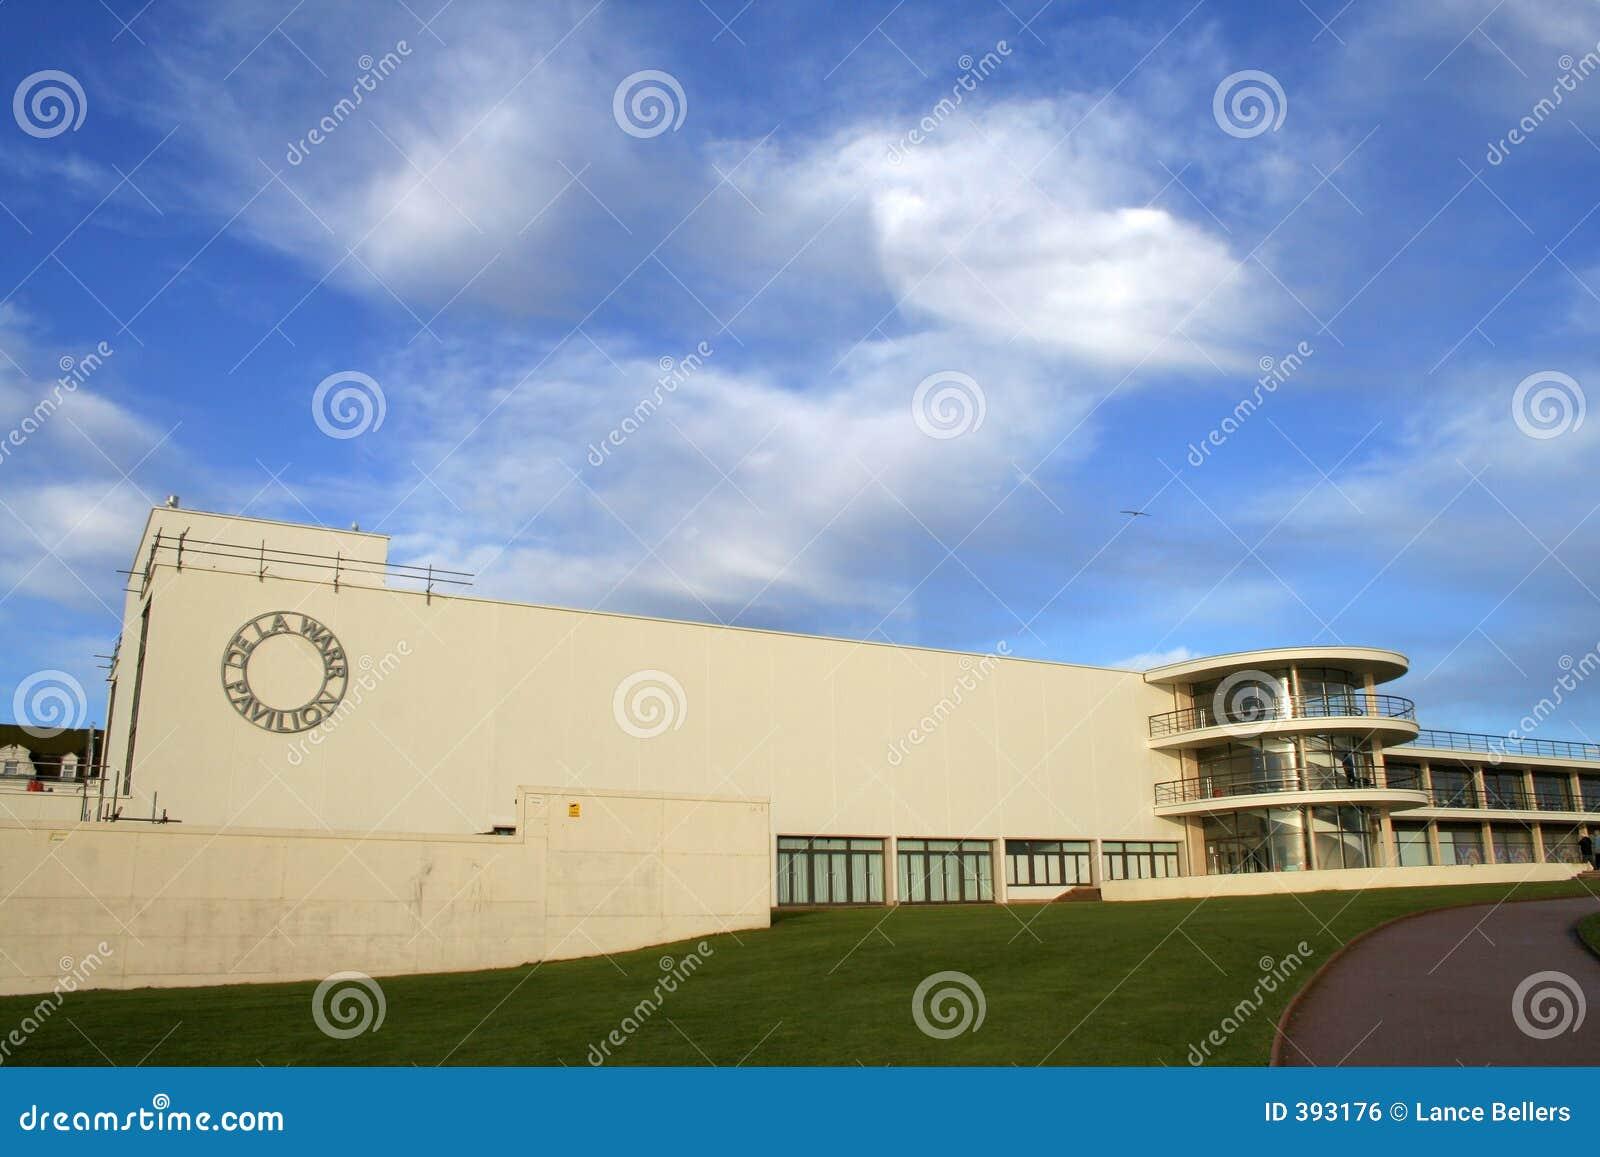 Bexhill Paviliion